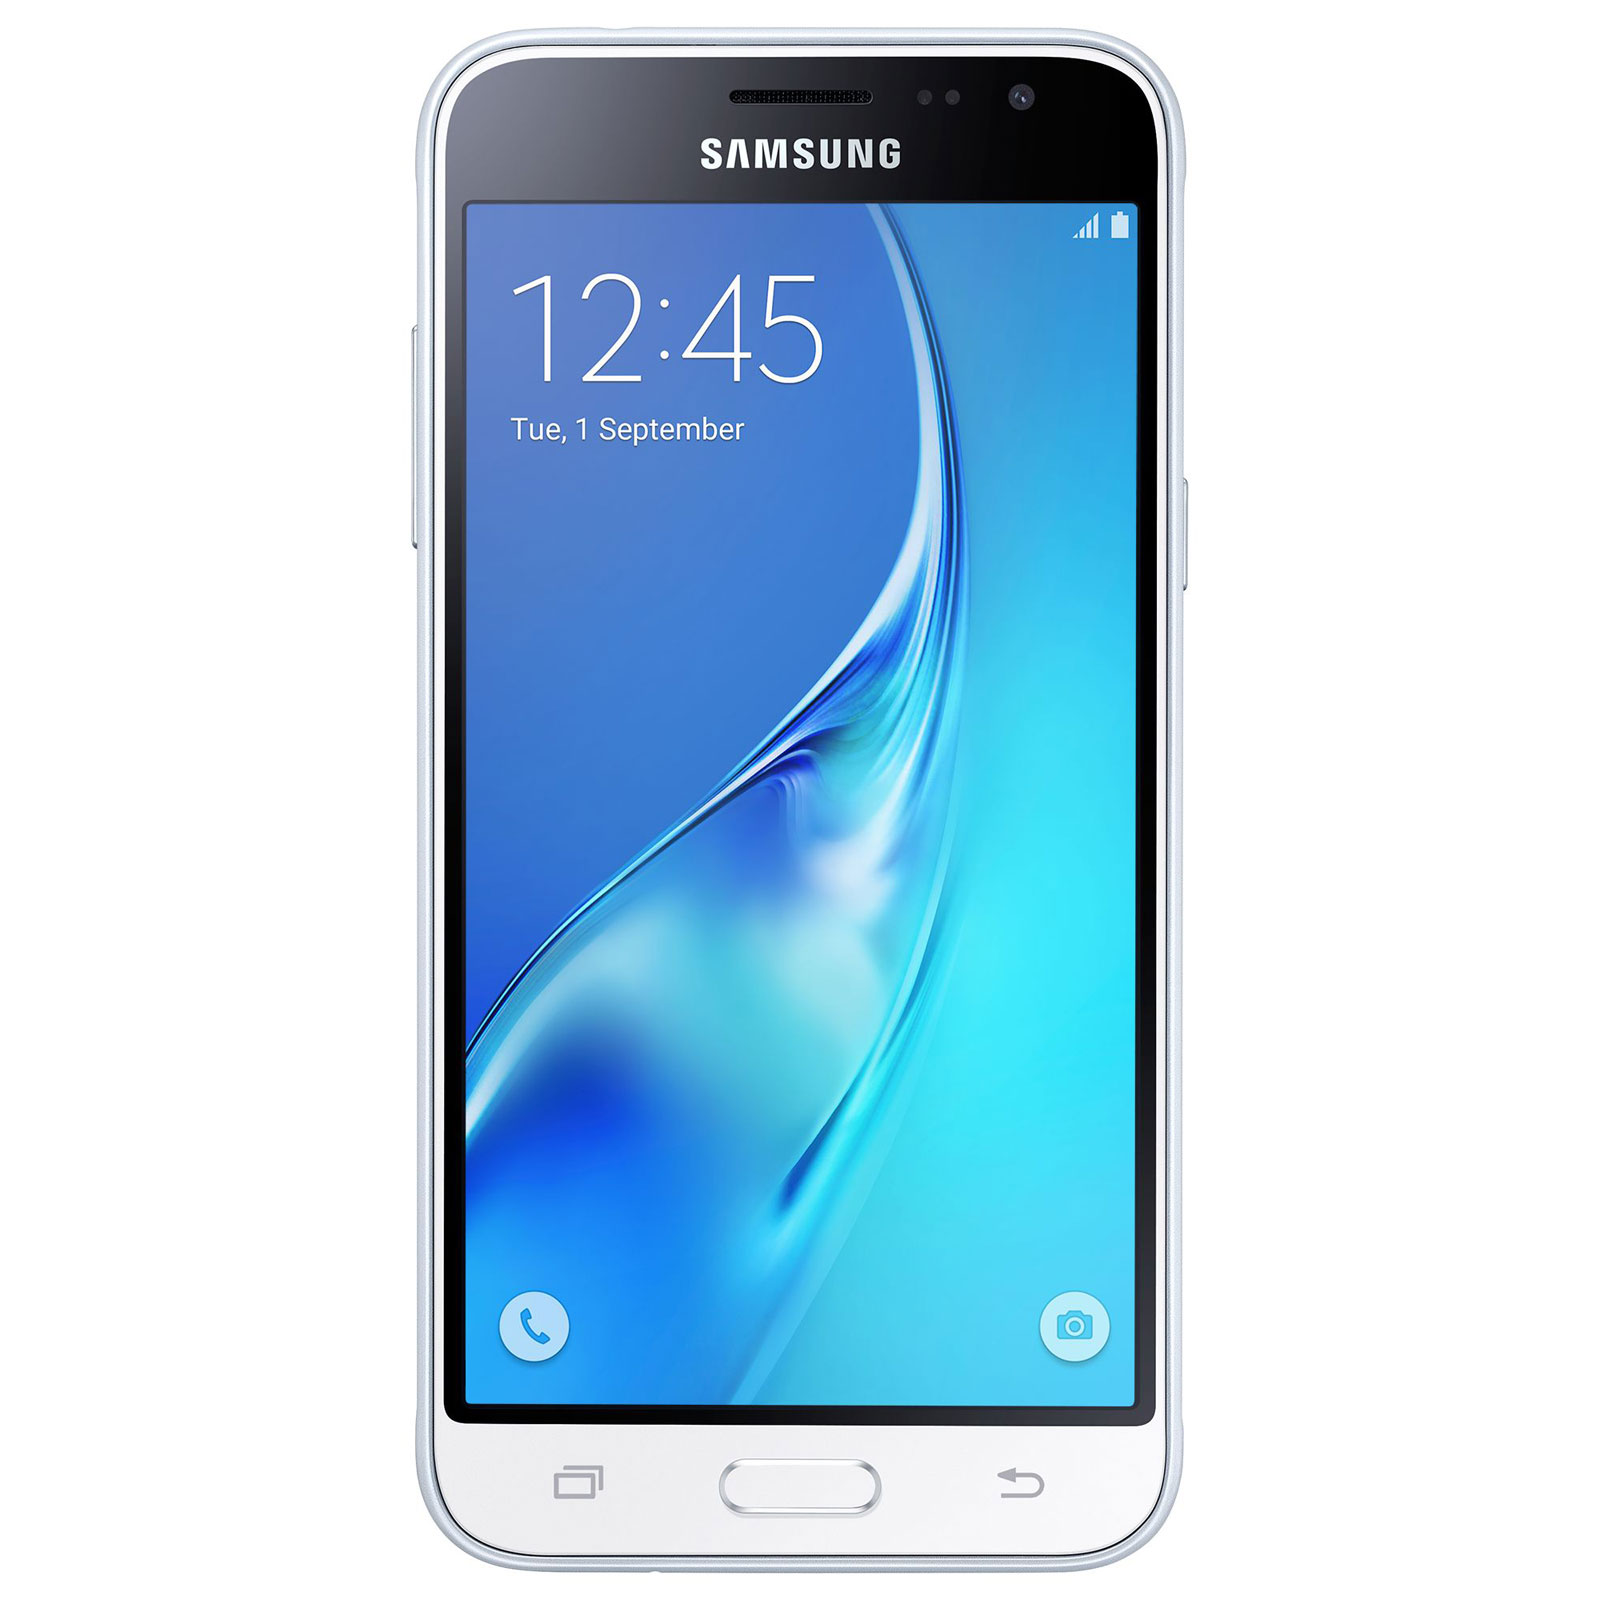 samsung galaxy j3 2016 blanc mobile smartphone samsung sur. Black Bedroom Furniture Sets. Home Design Ideas